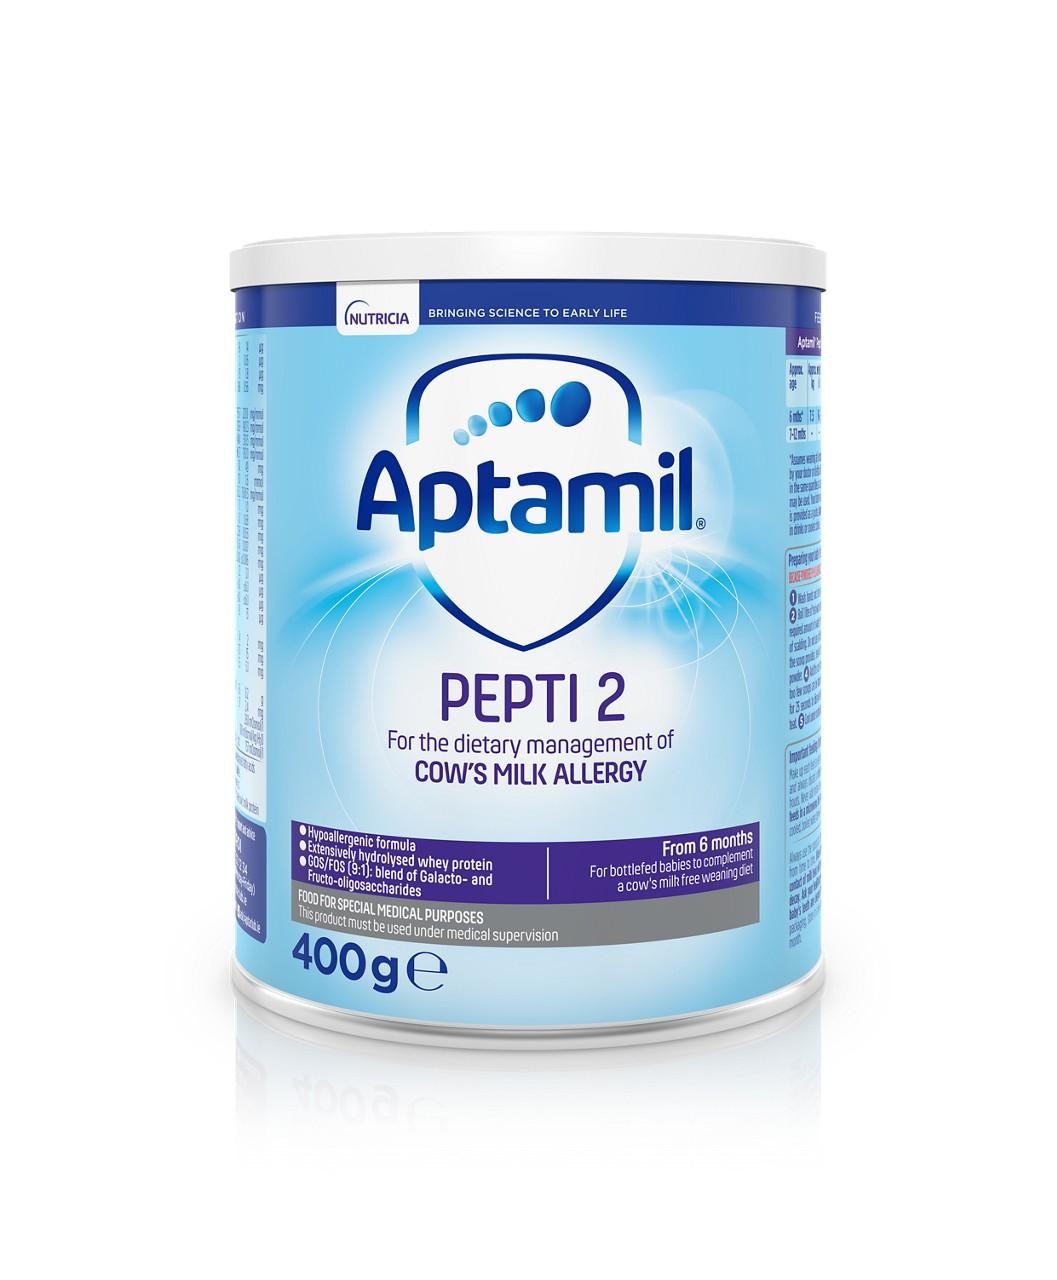 aptamil-pepti2-400g-packshot.tif